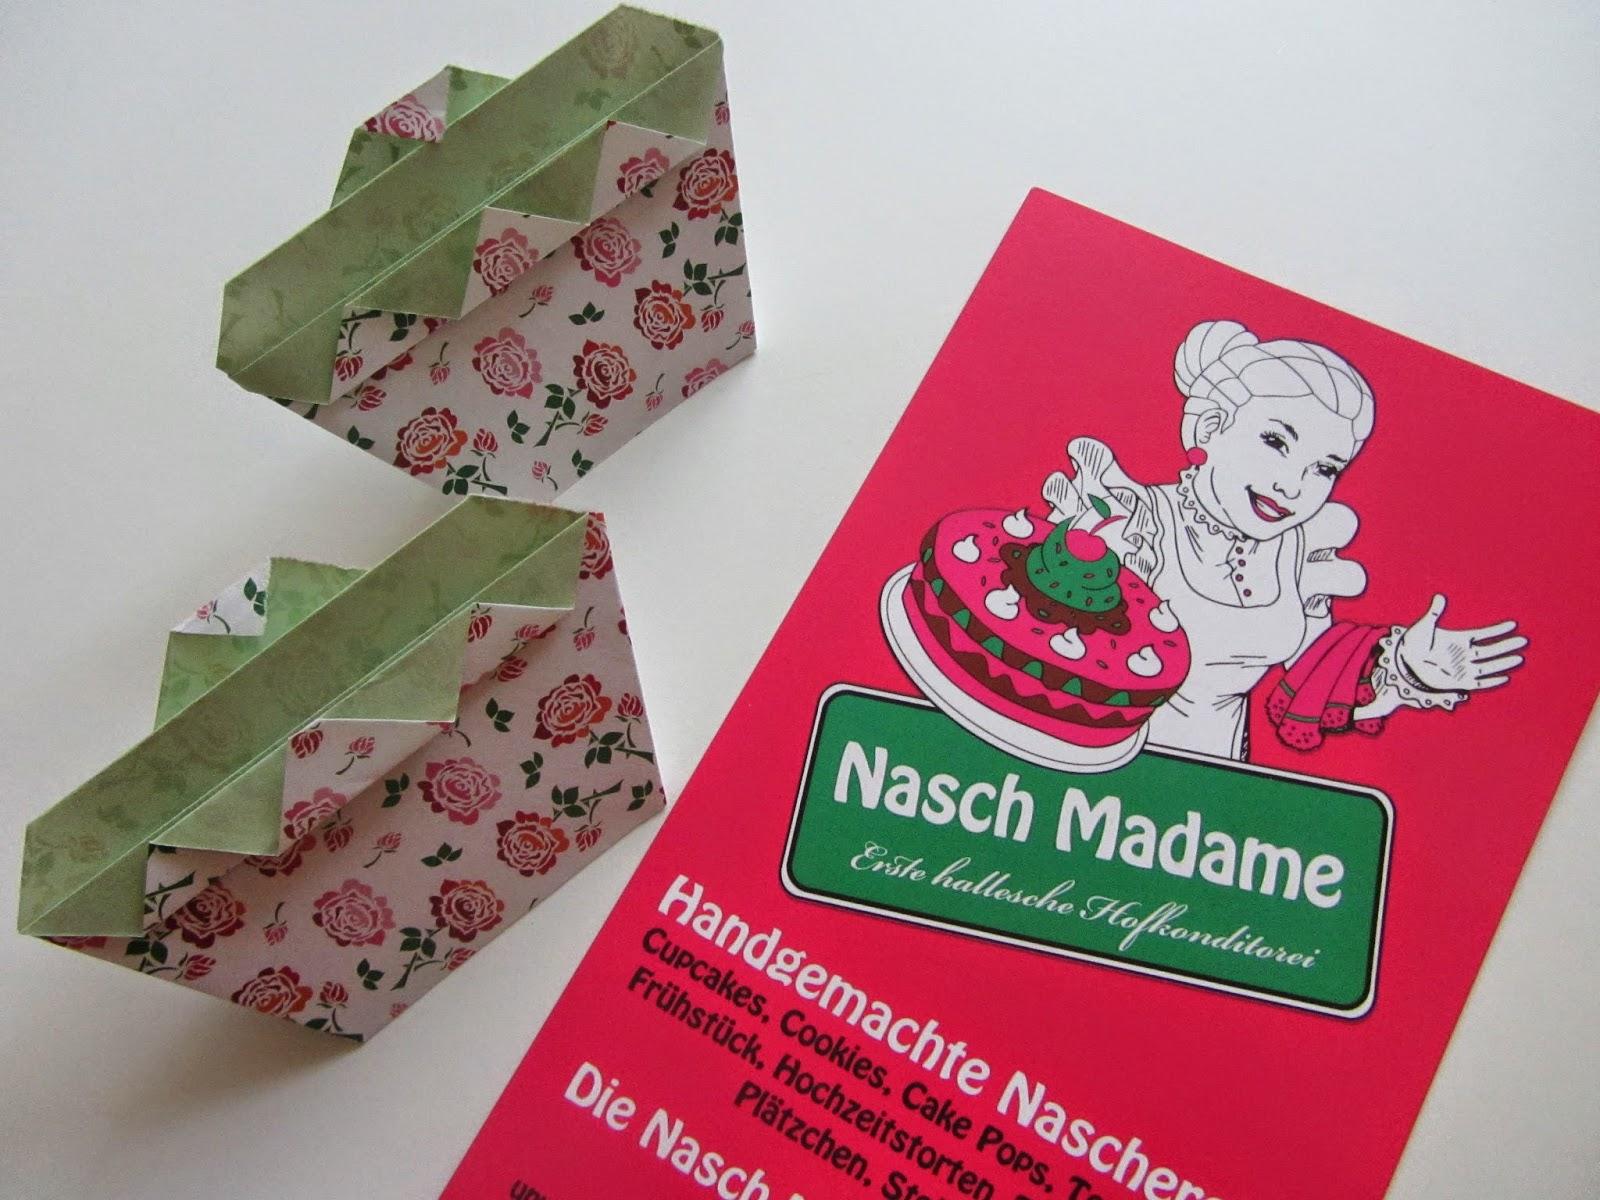 Origami Cupcake, Bastelblog, Häkelblog, Nasch Madame, DIY, Liebenswelt